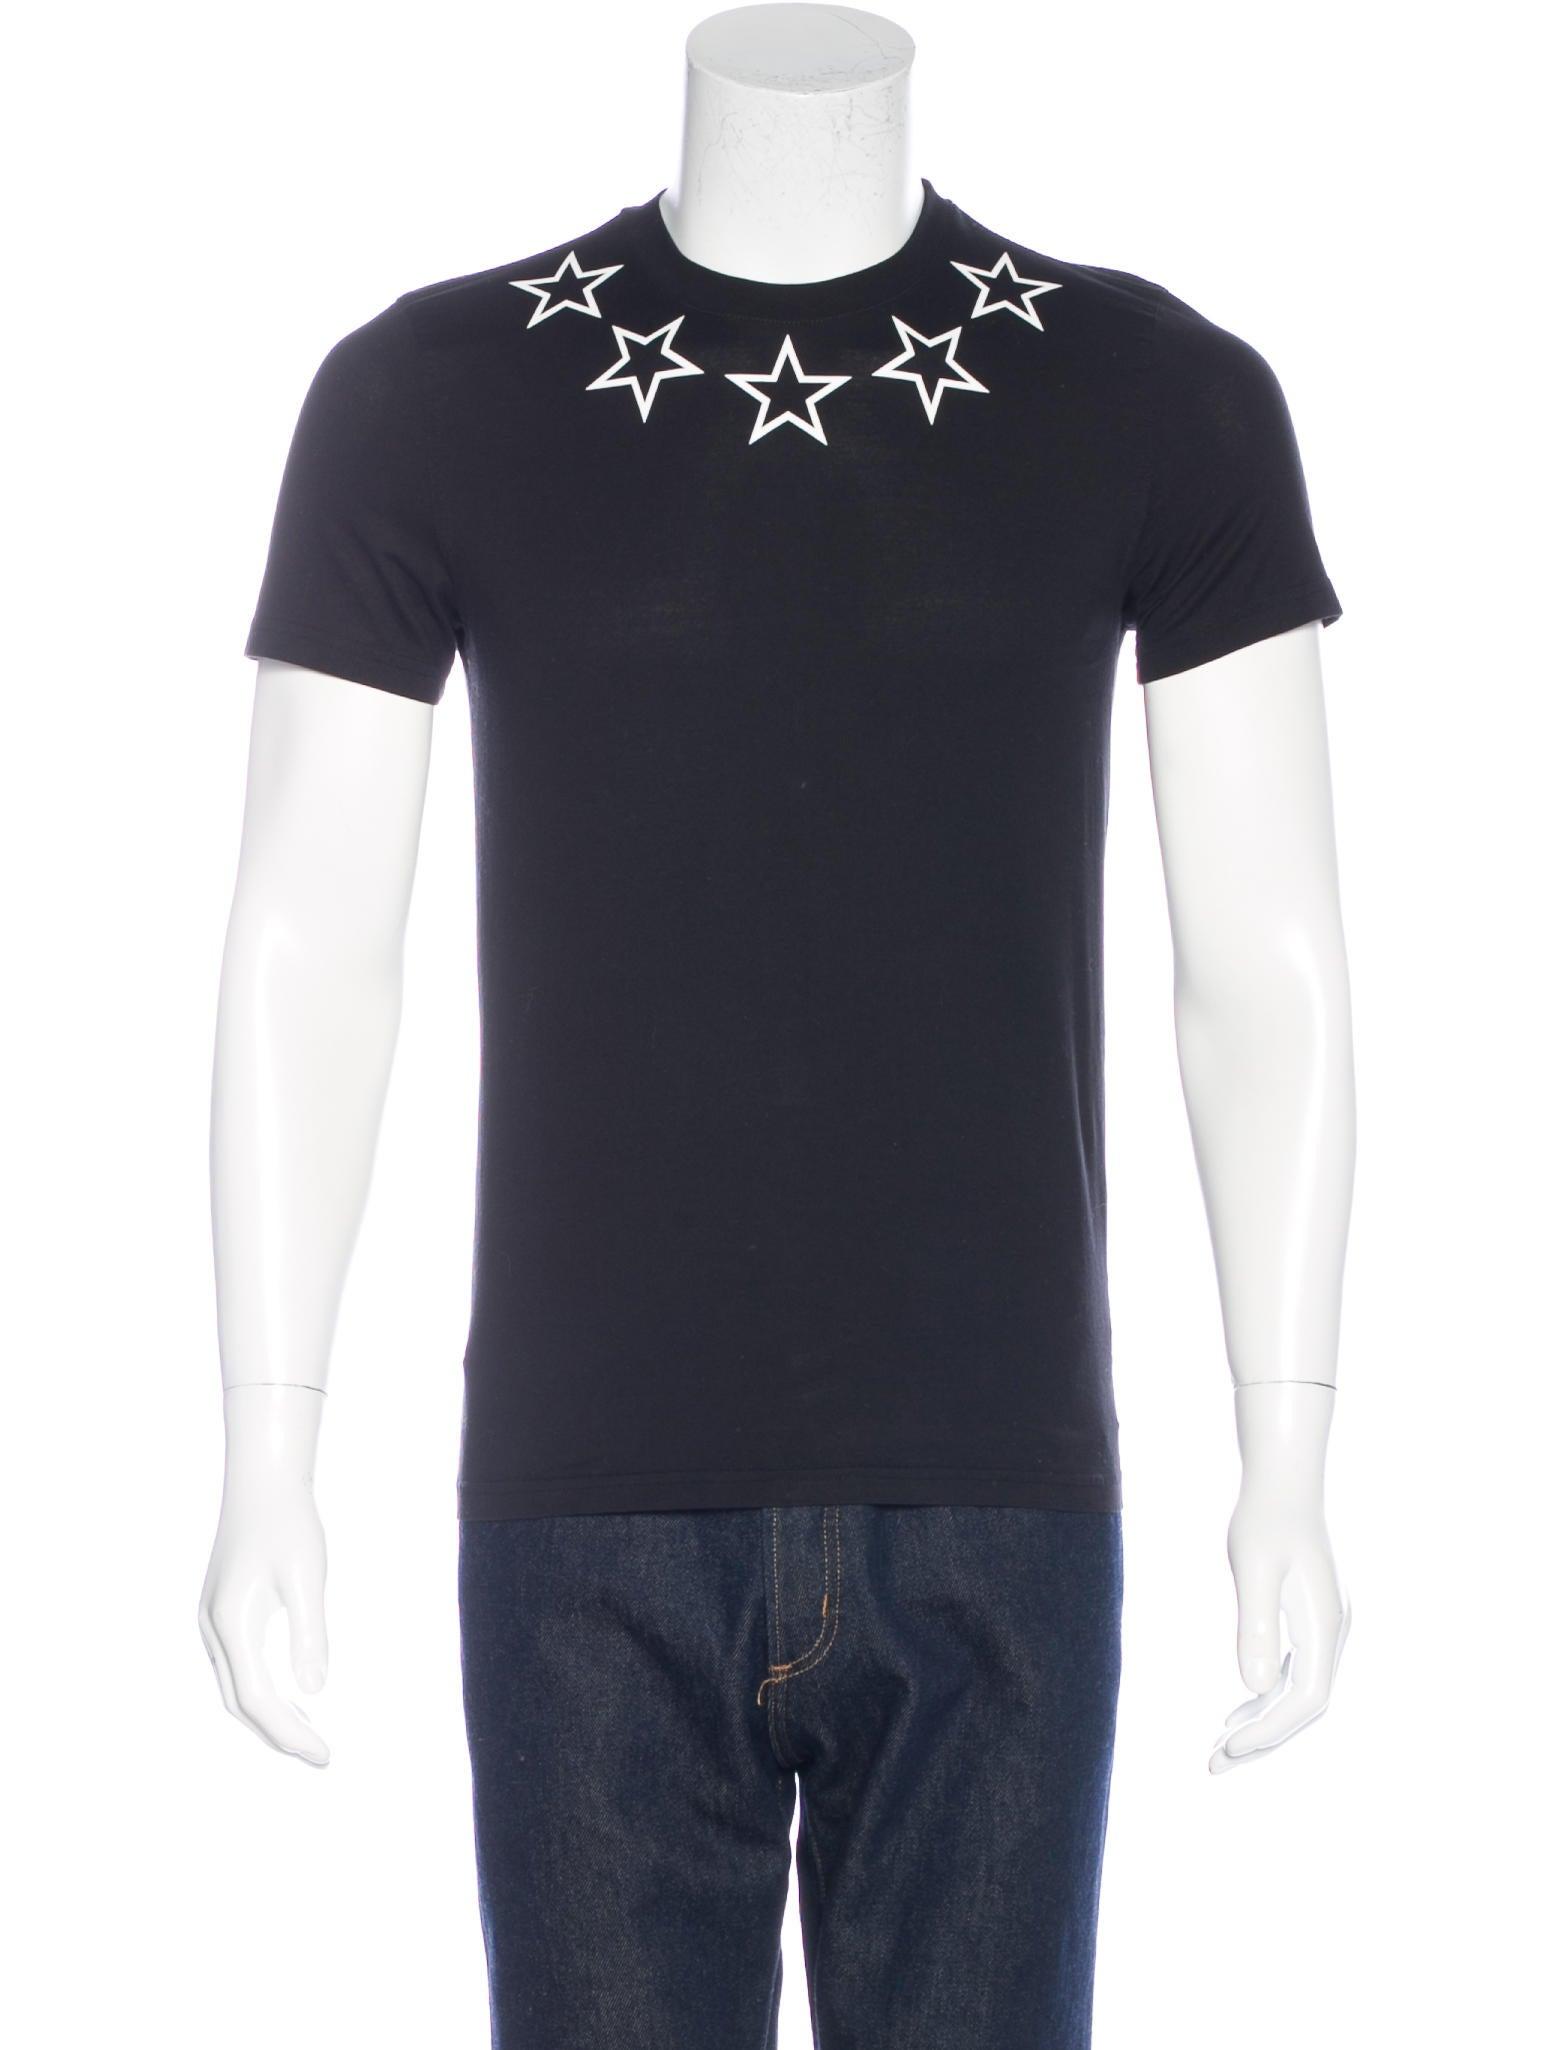 Givenchy 2016 star print t shirt clothing giv36830 for Givenchy star t shirt